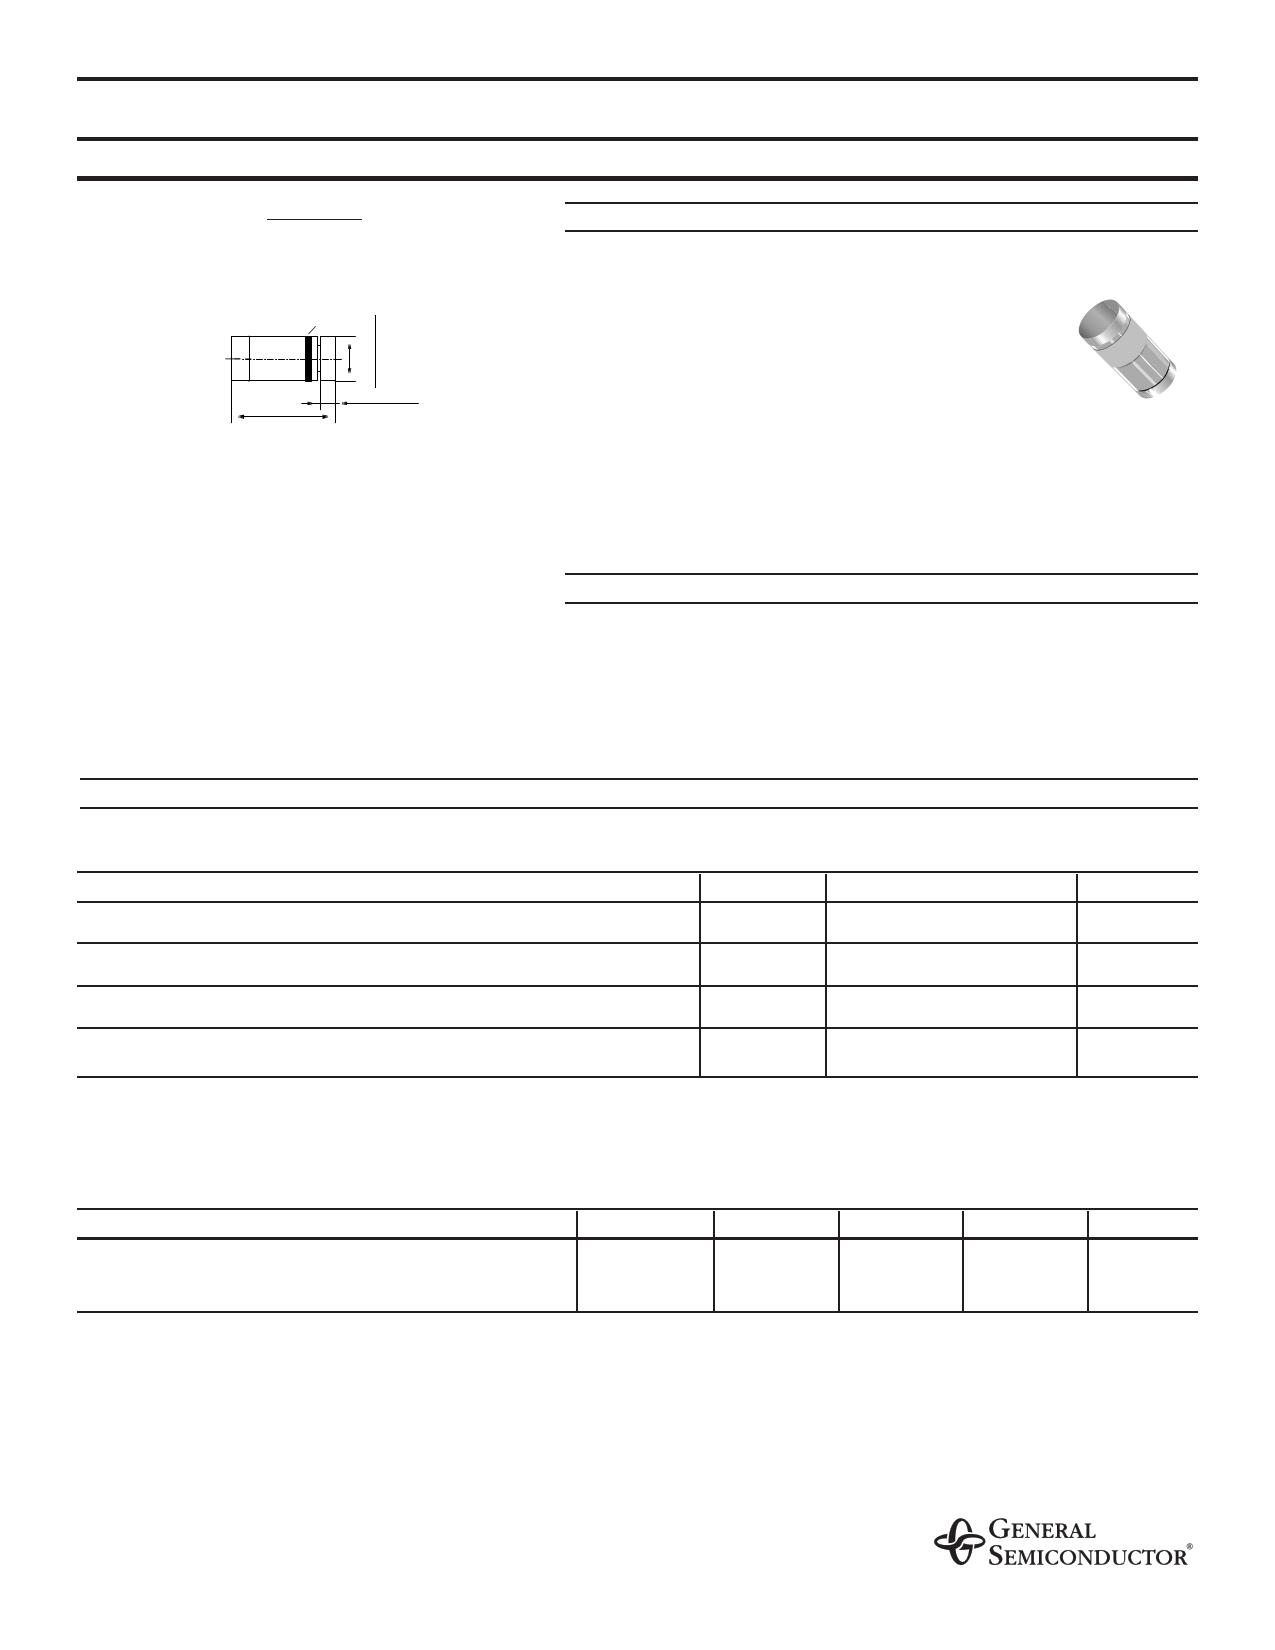 ZMM43 datasheet